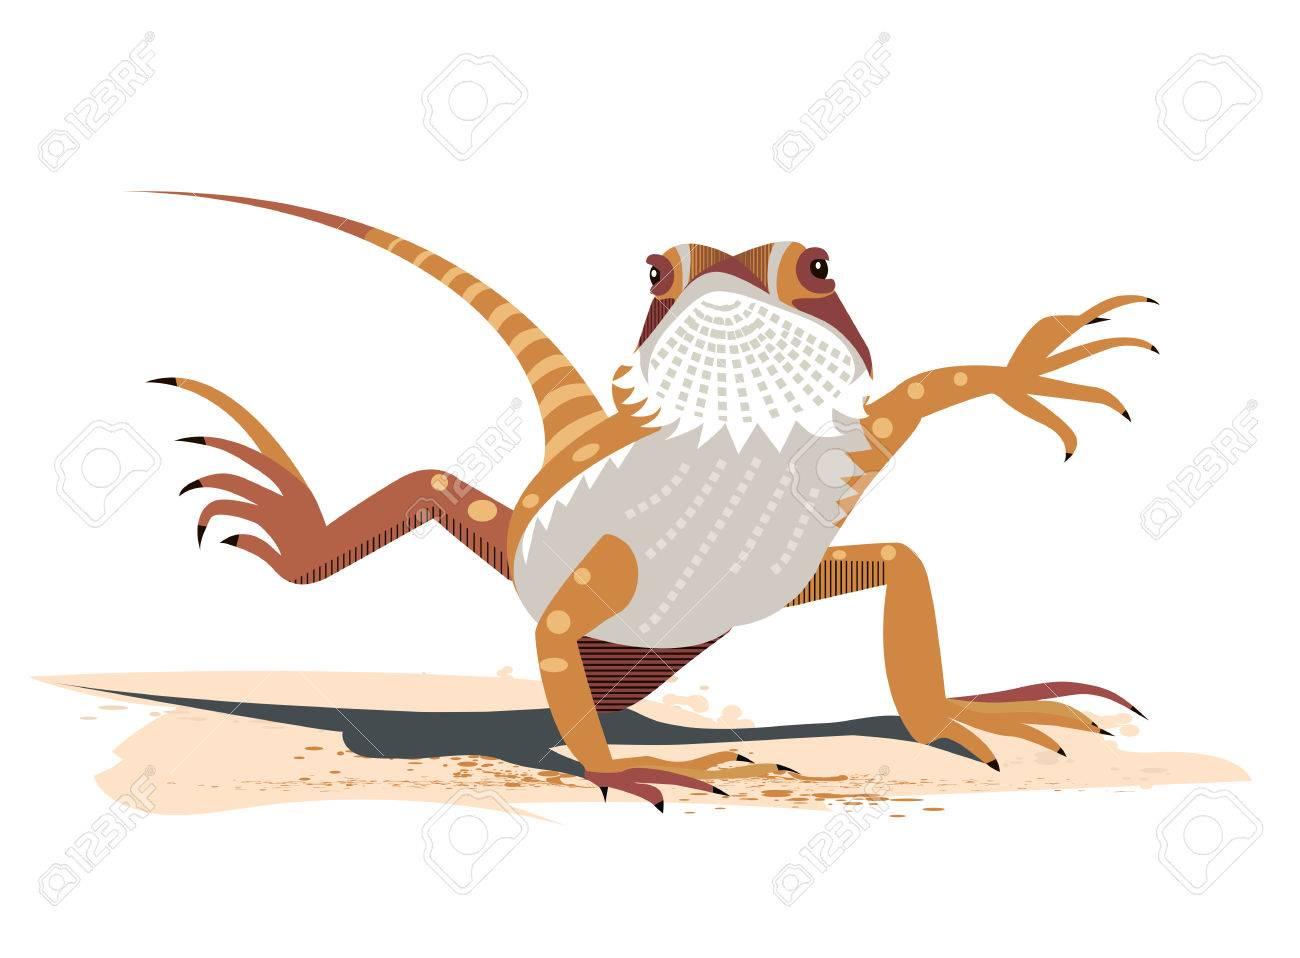 Kung Fu of the Bearded Dragon (Pogona vitticeps) Stock Vector - 84282525